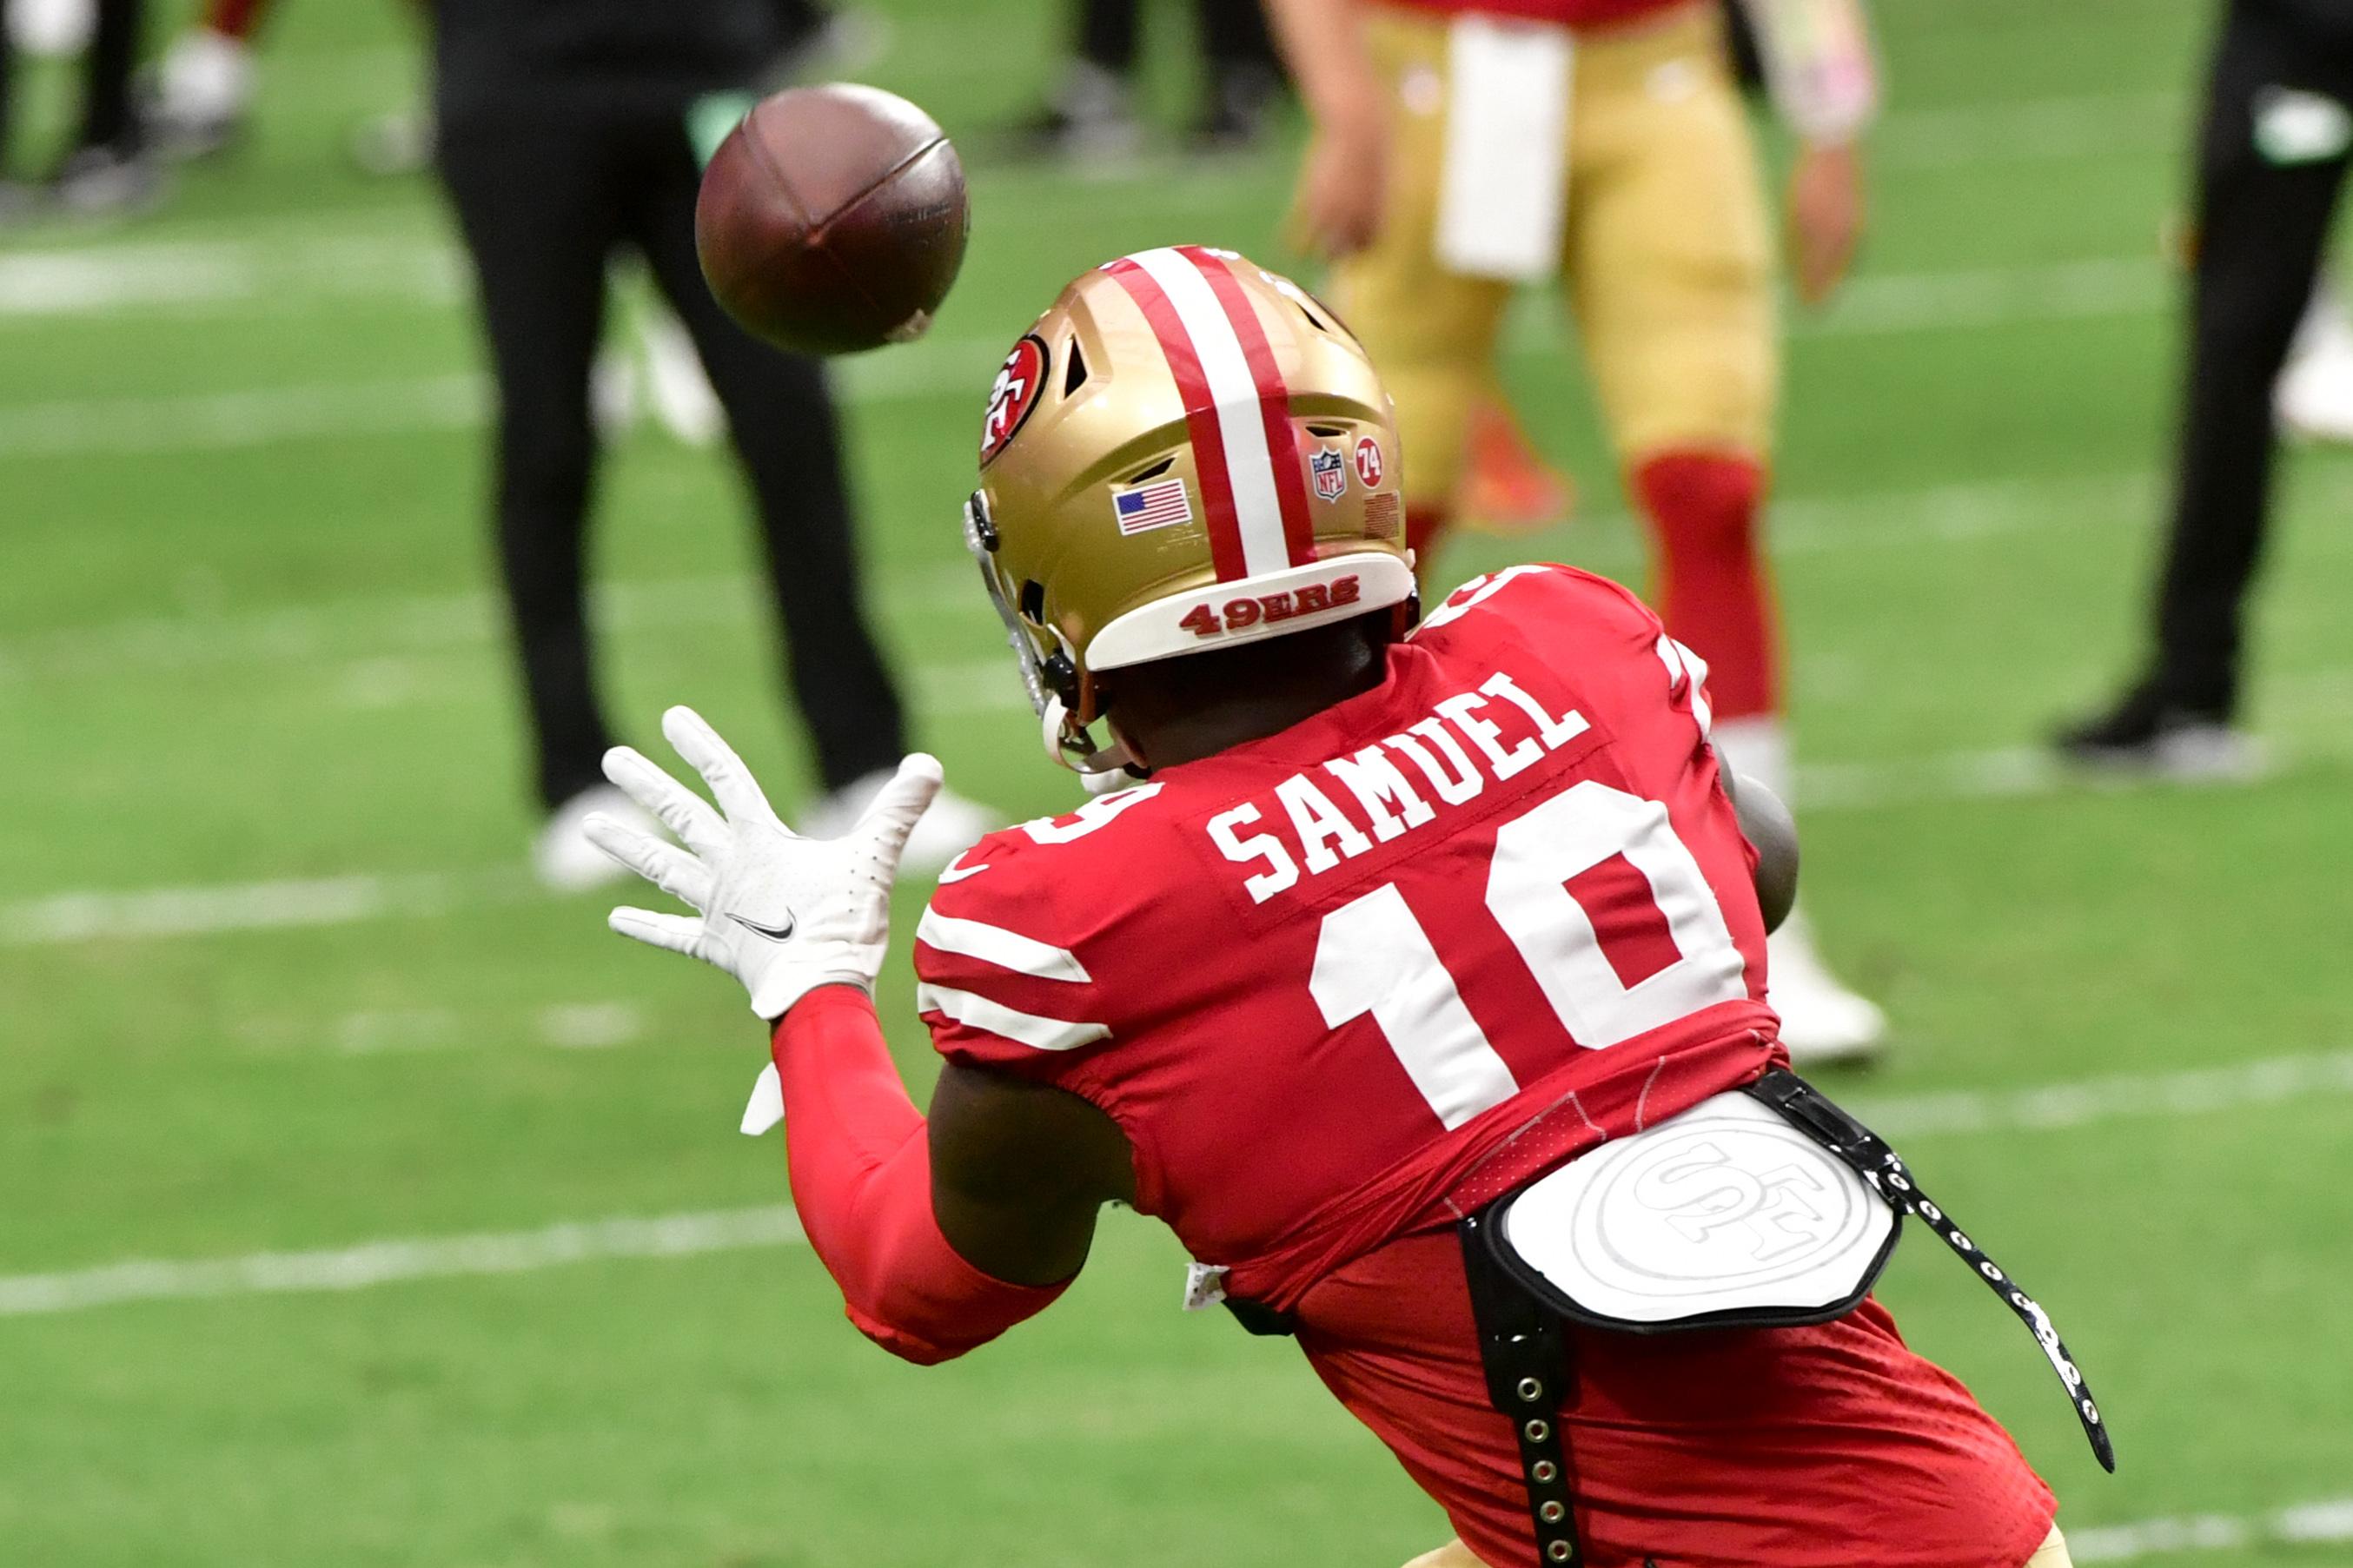 NFL: Washington Football Team at San Francisco 49ers